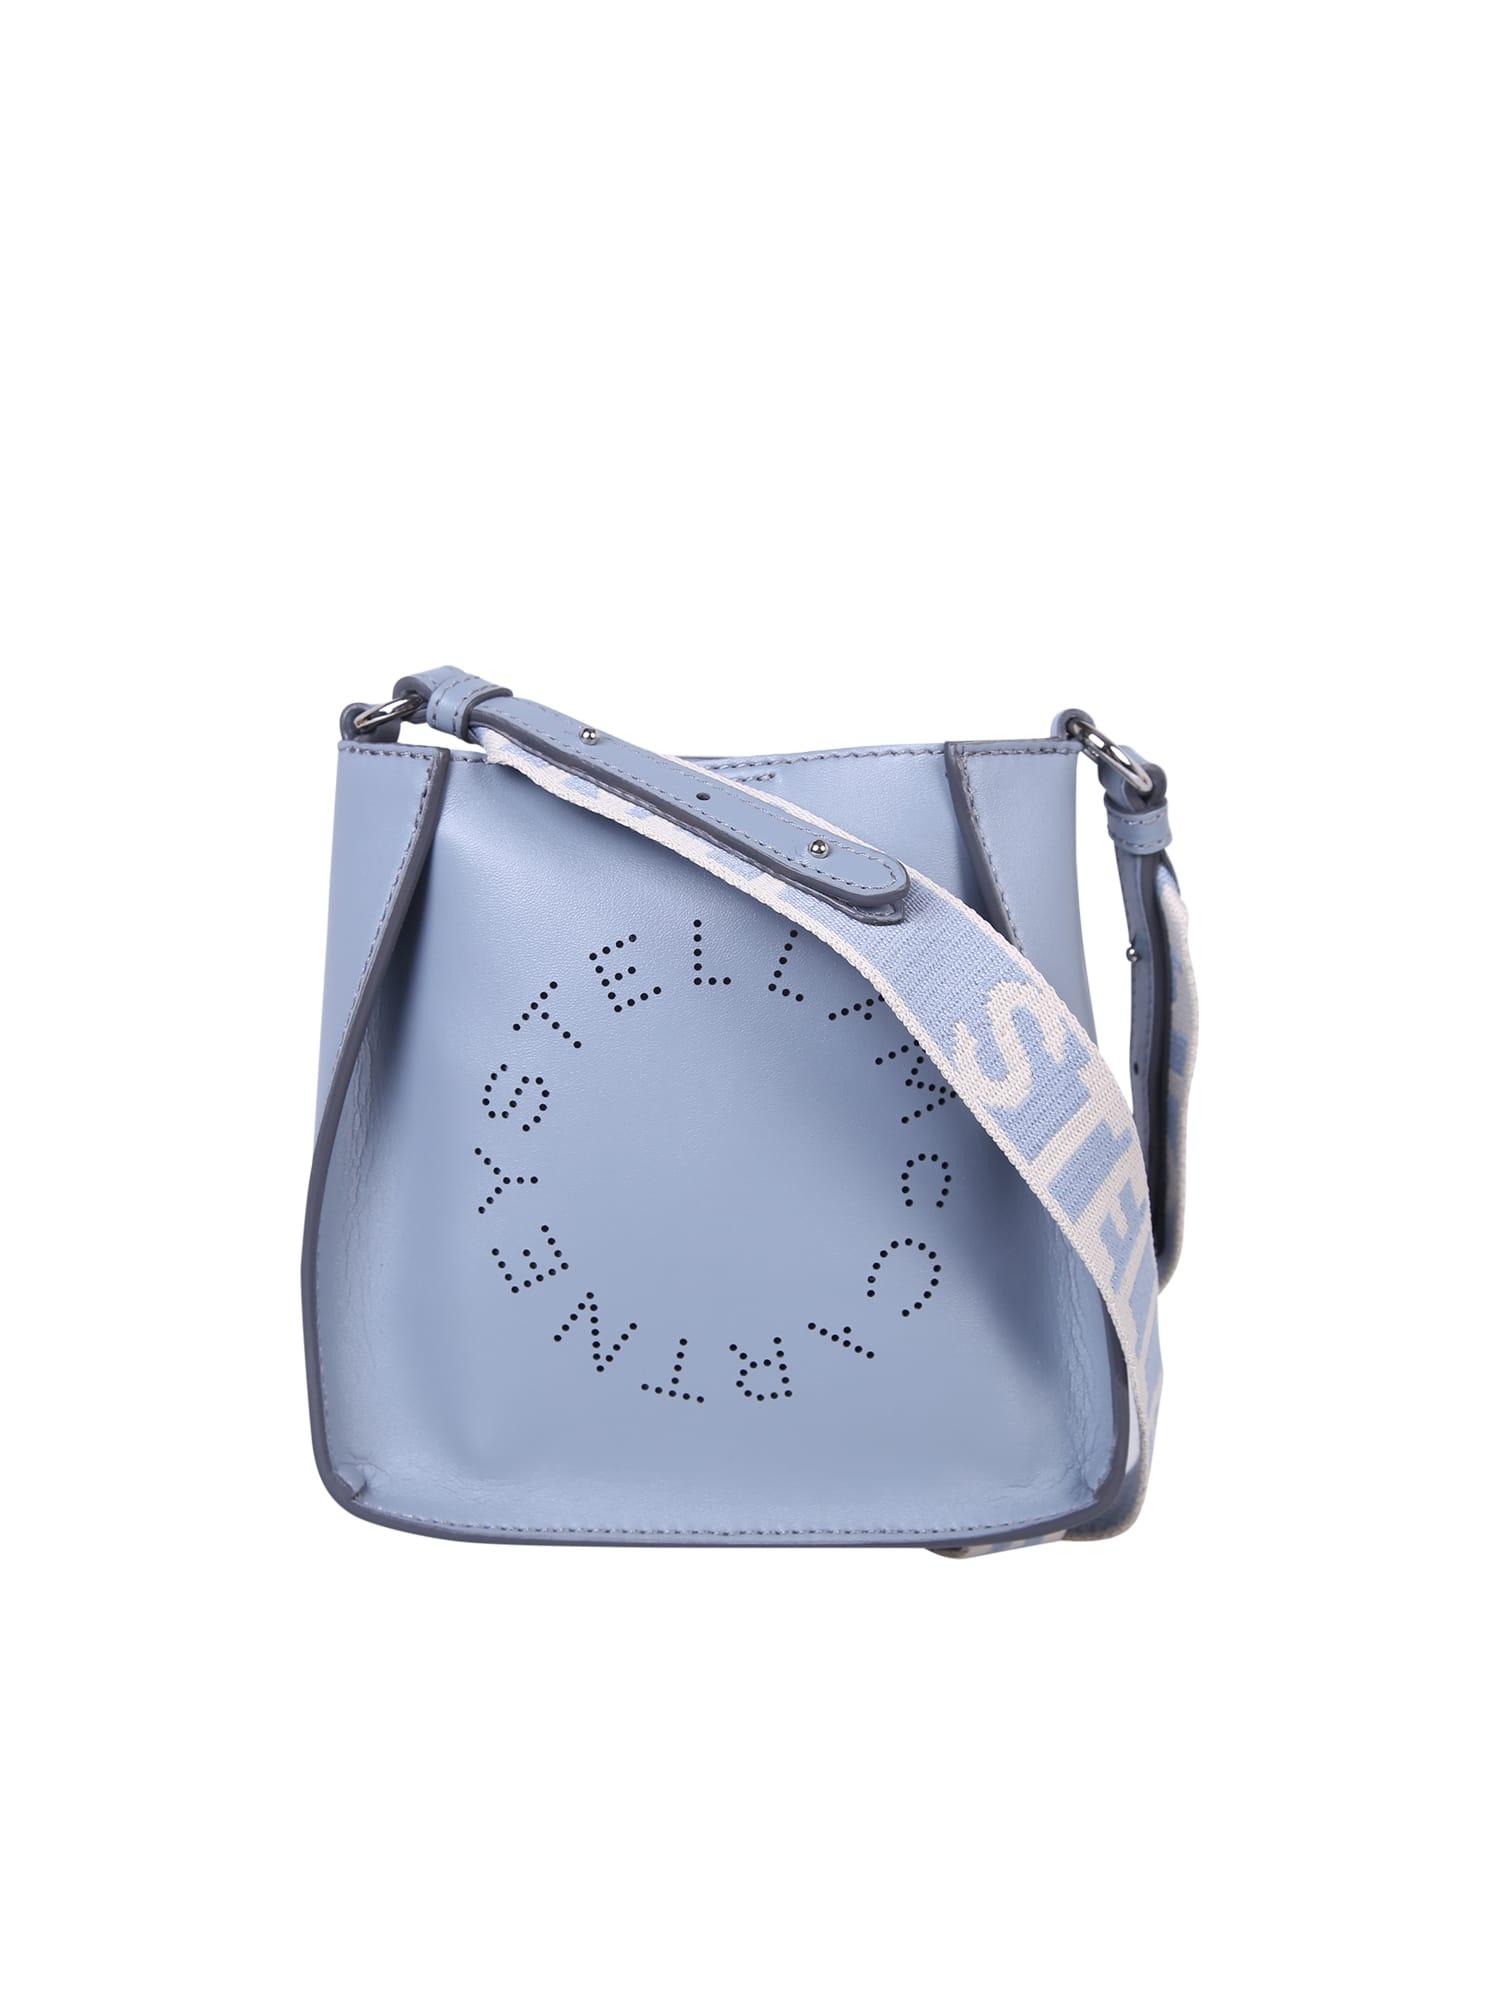 Stella Mccartney Bags BRANDED BAG